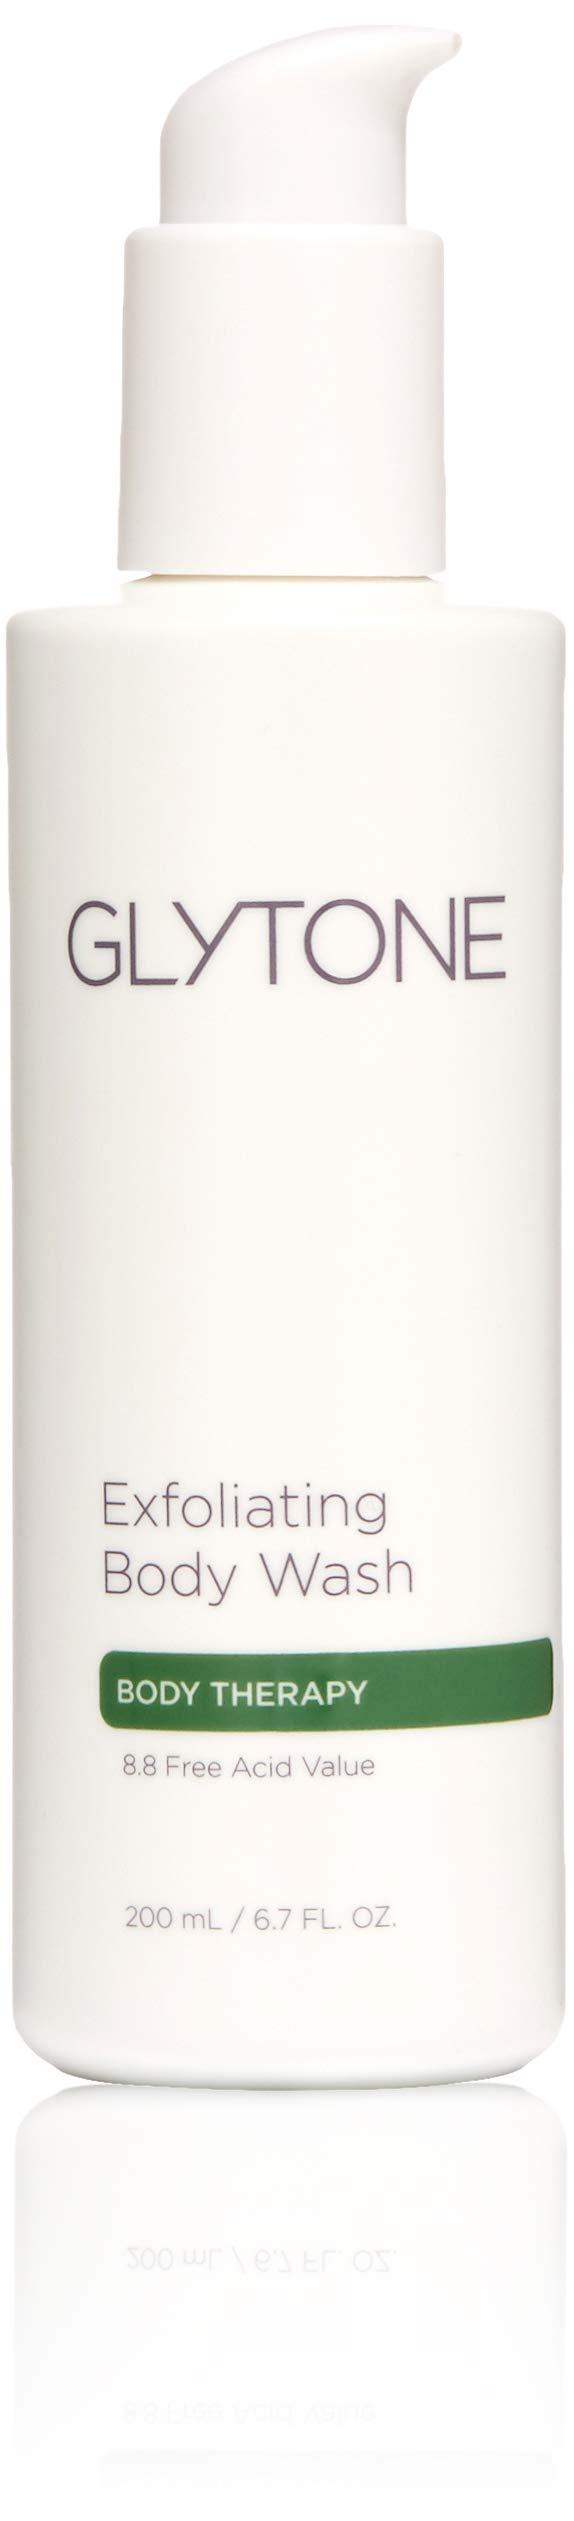 Glytone Exfoliating Body Wash with Glycolic Acid, Keratosis Pilaris, KP, Smooth Rough & Bumpy Skin, Chicken Skin, Oil-Free, Fragrance-Free 6.7 oz. by GLYTONE